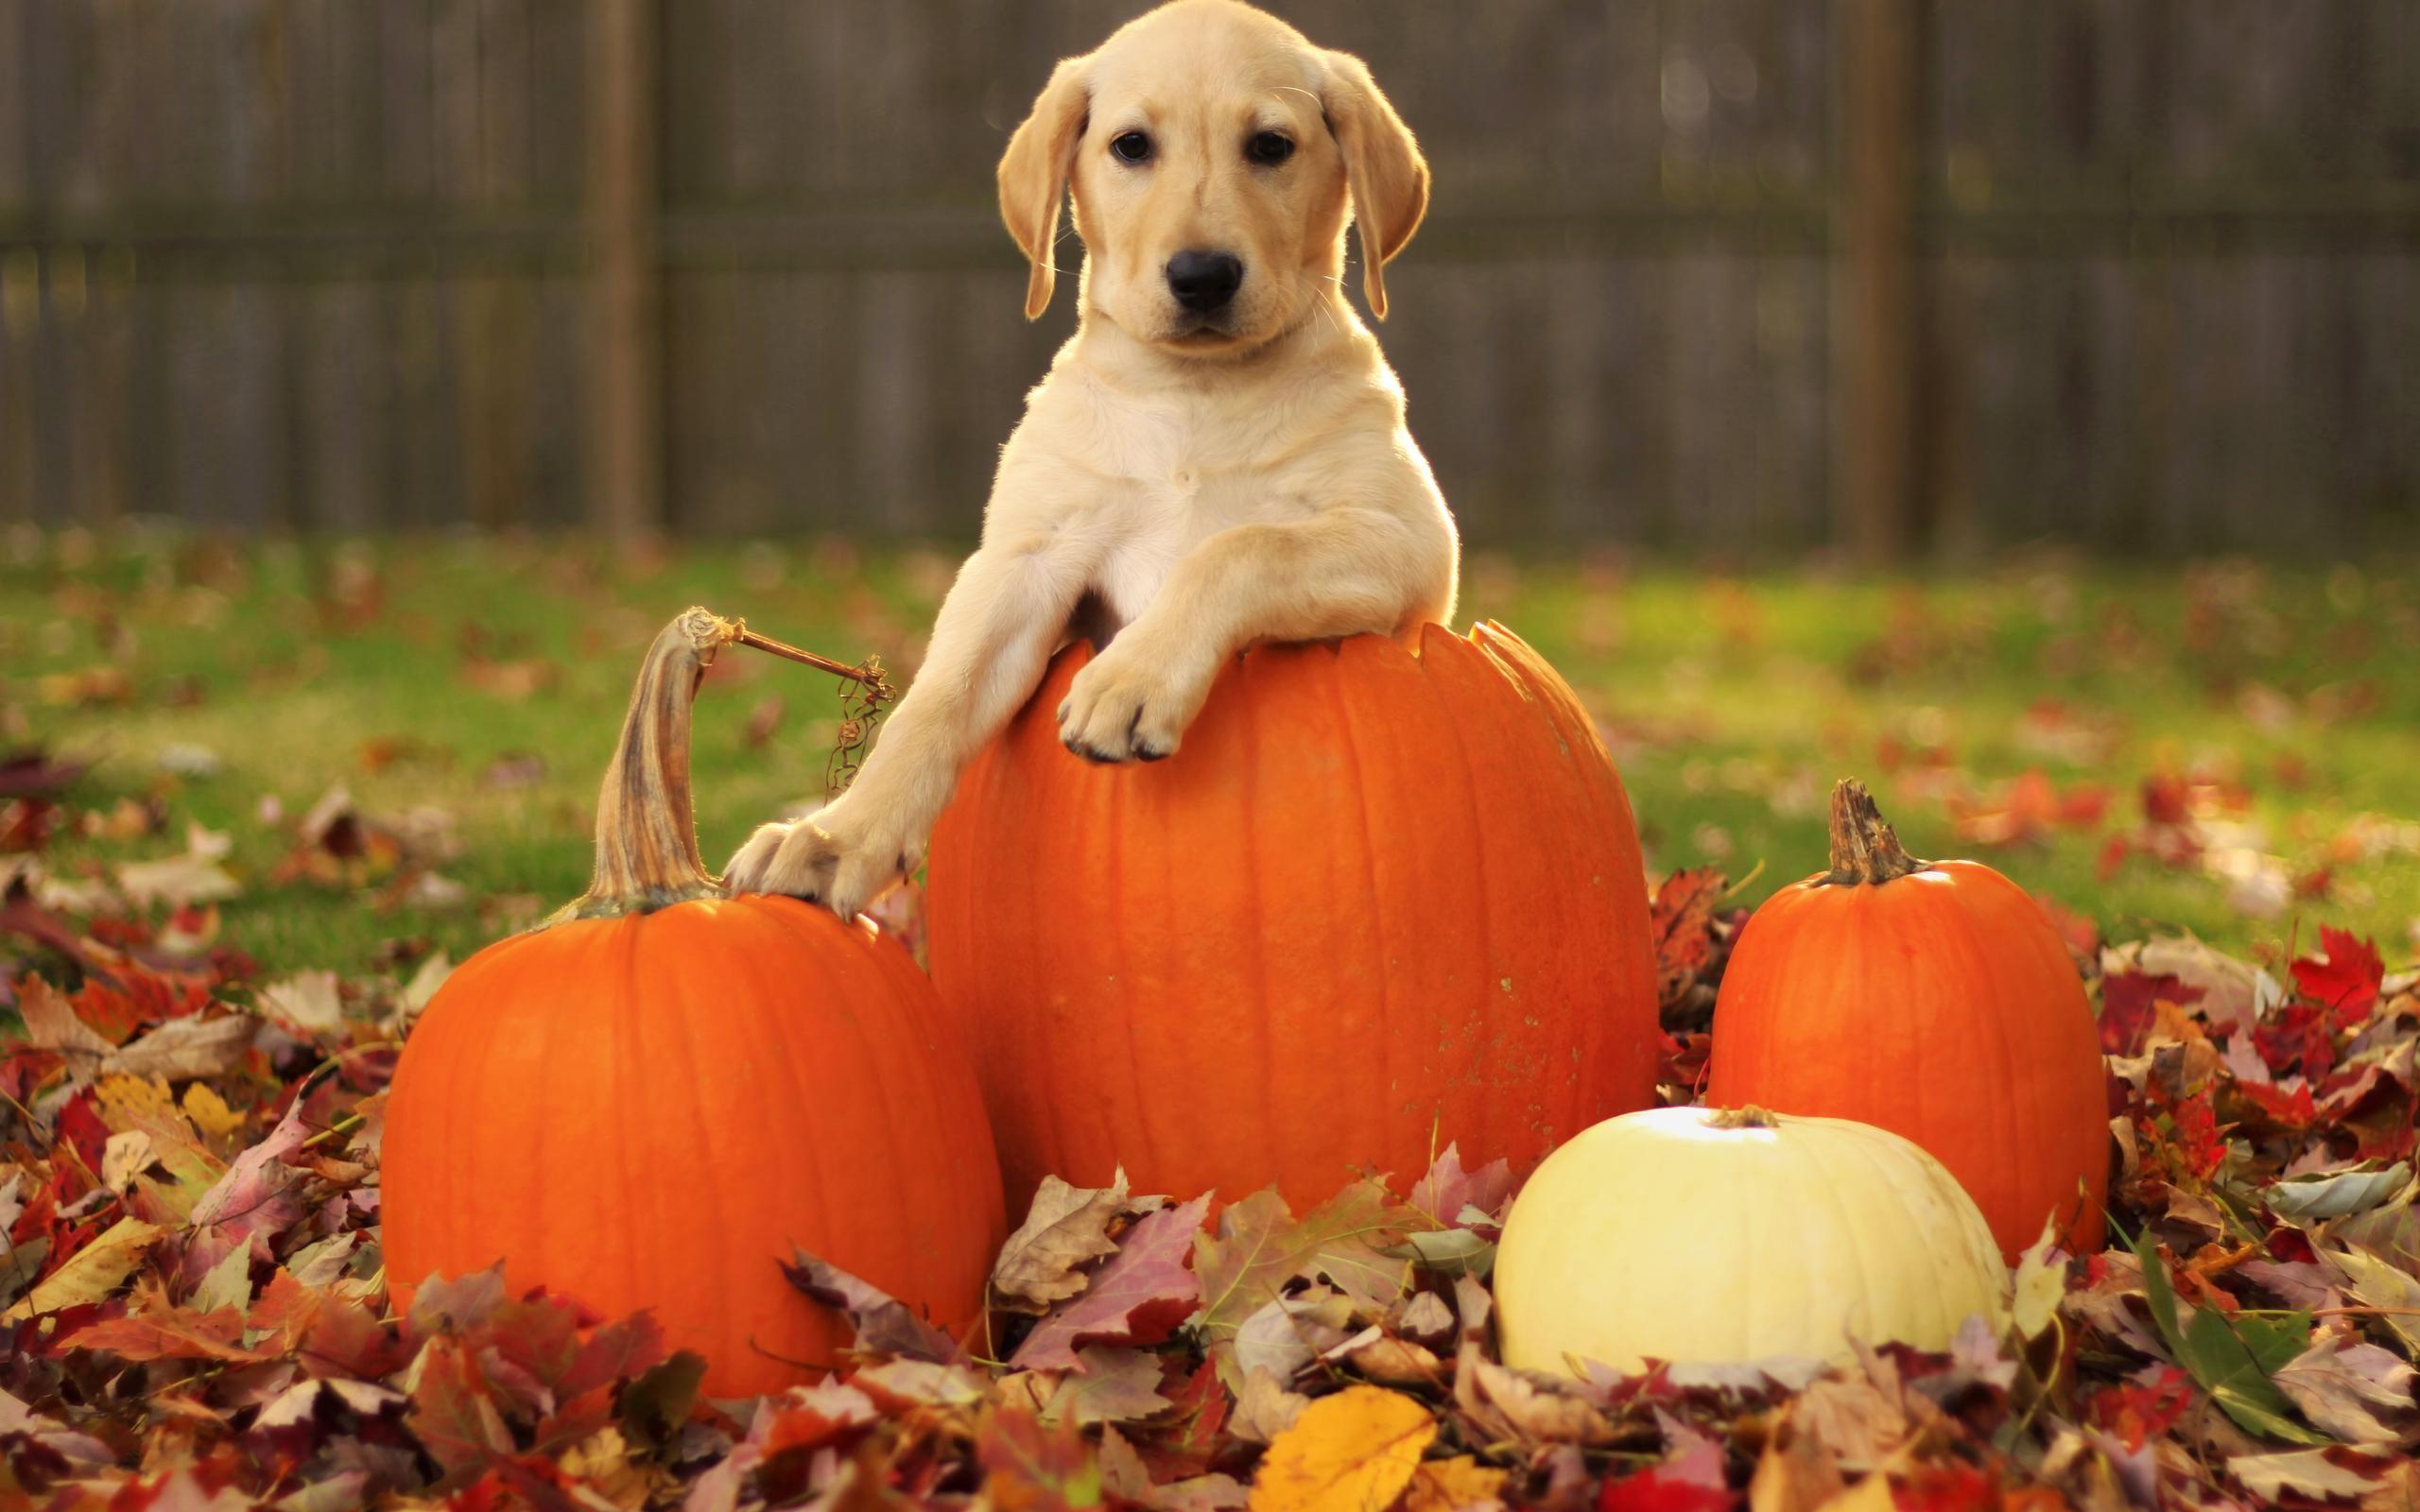 Top Wallpaper Halloween Puppy - 3f347775b9ced6910bd01c8e2a2123a1  Picture_744743.jpg